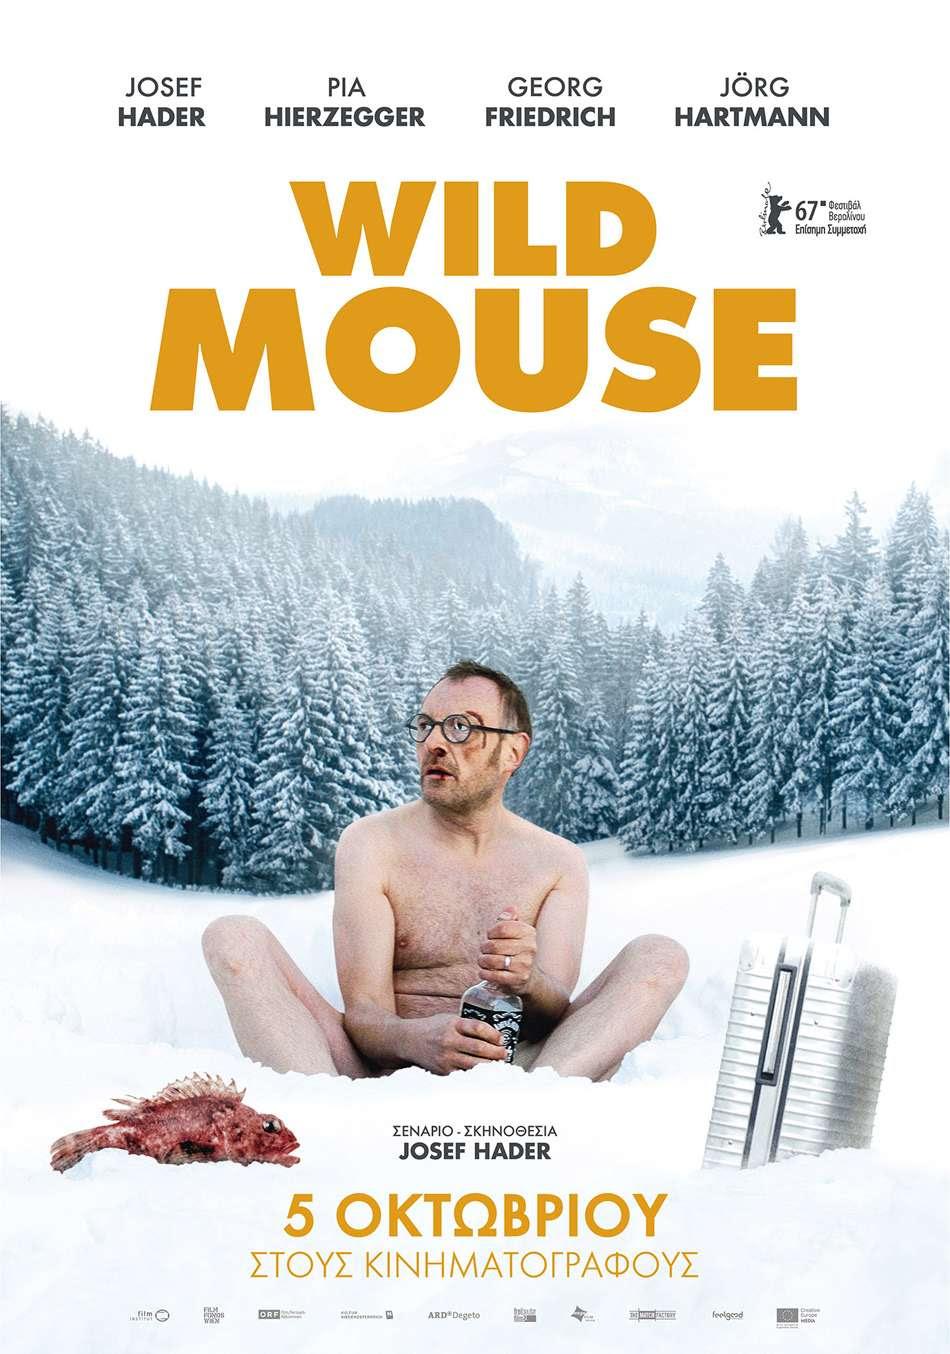 Wilde Maus (Wild Mouse) Poster Πόστερ